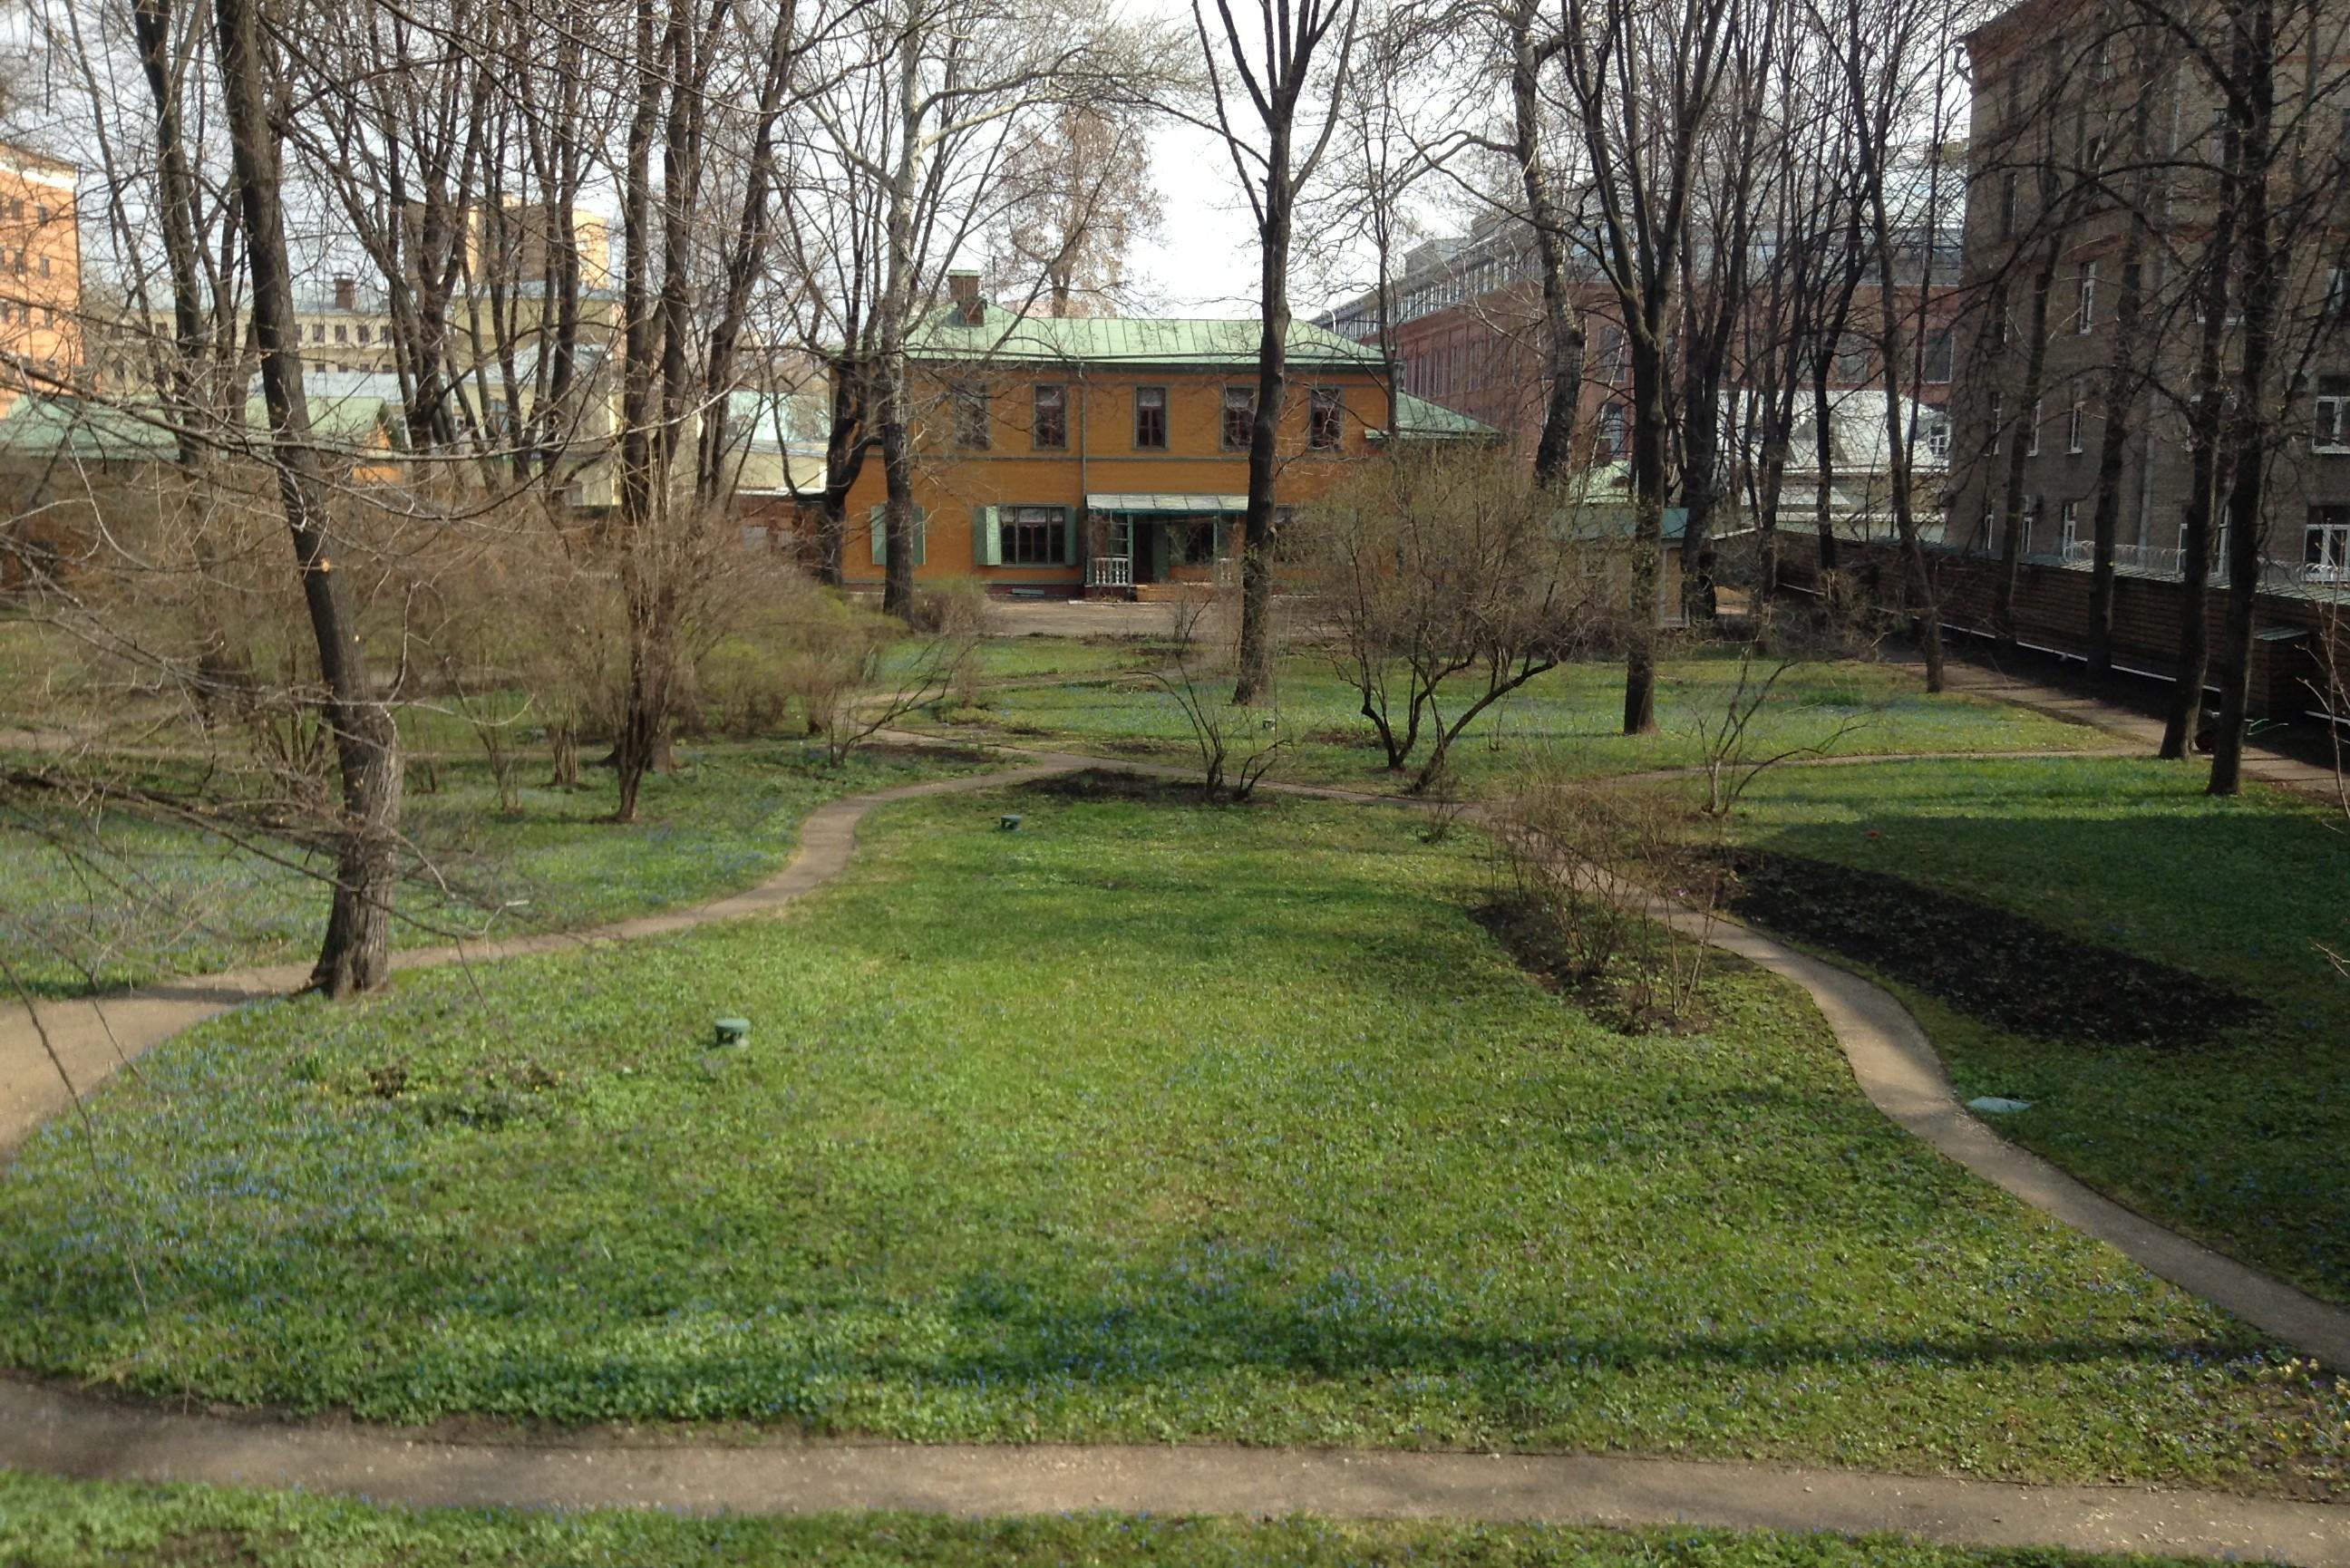 L. Tolstoy's house